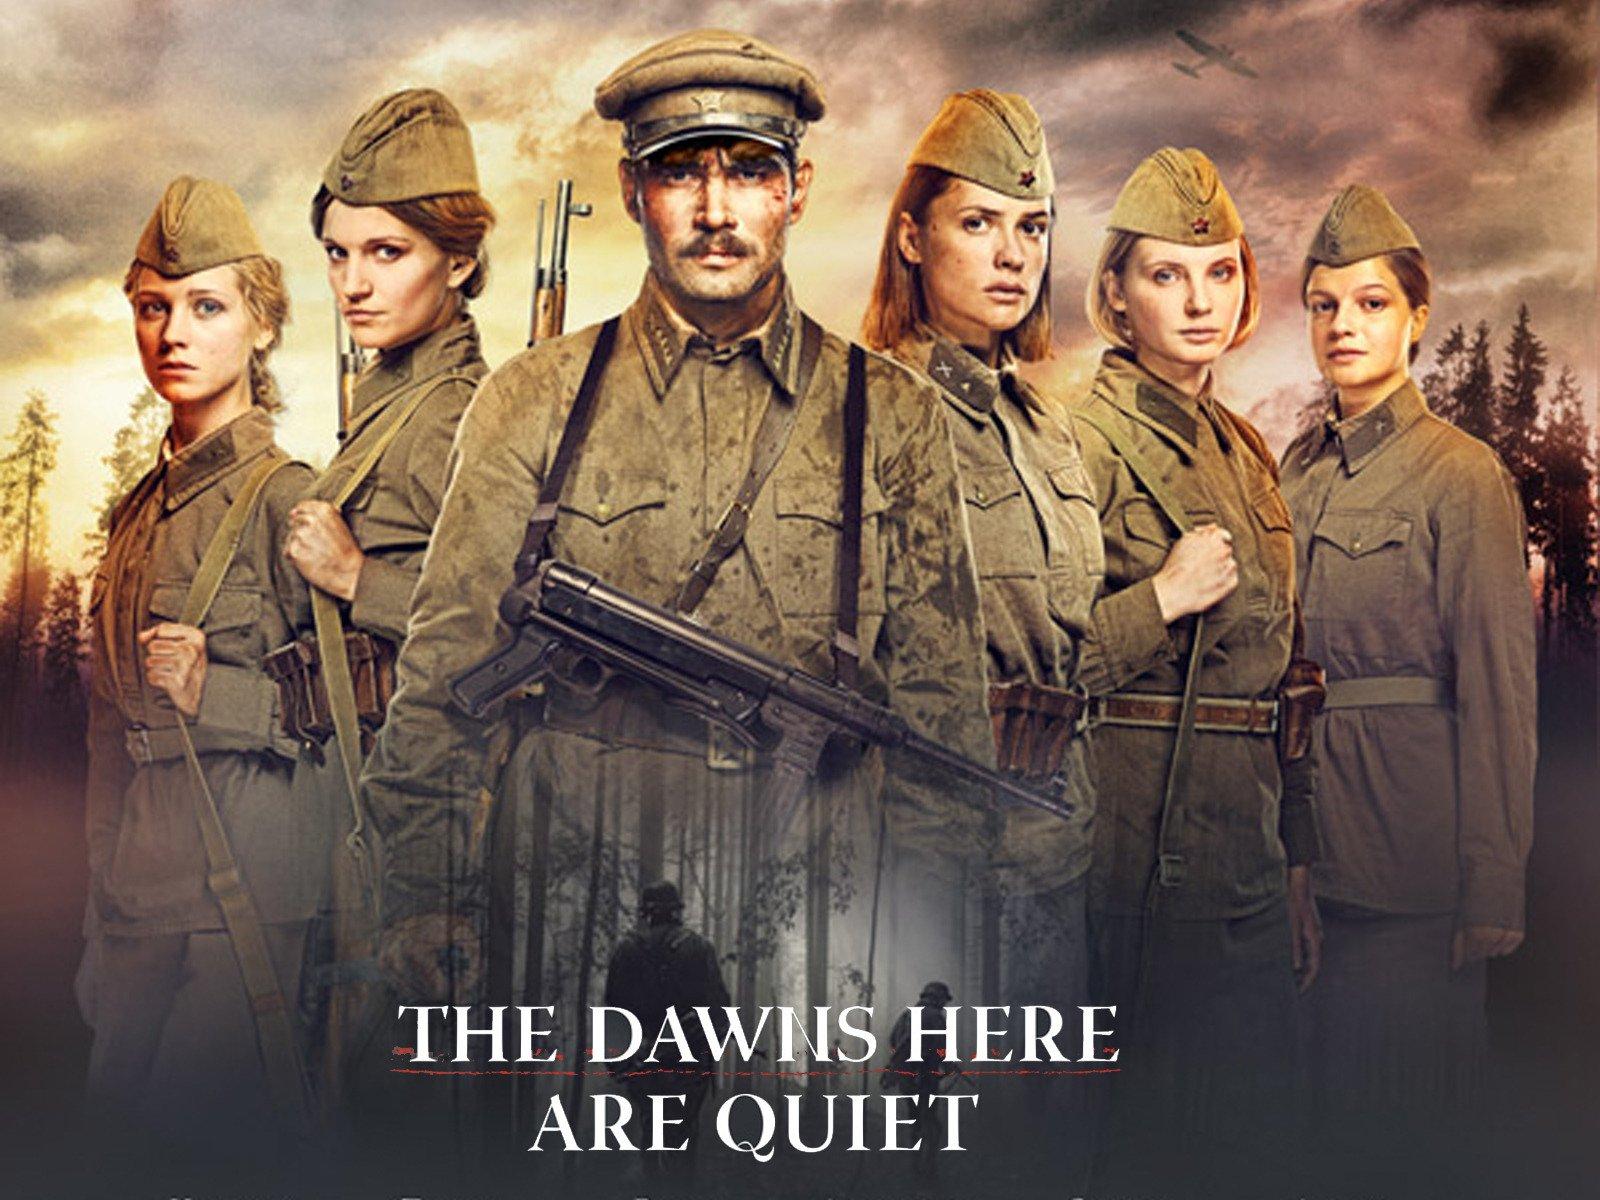 Amazon.com: The Dawns Here Are Quiet: Petr Fyodorov, Anastasia ...